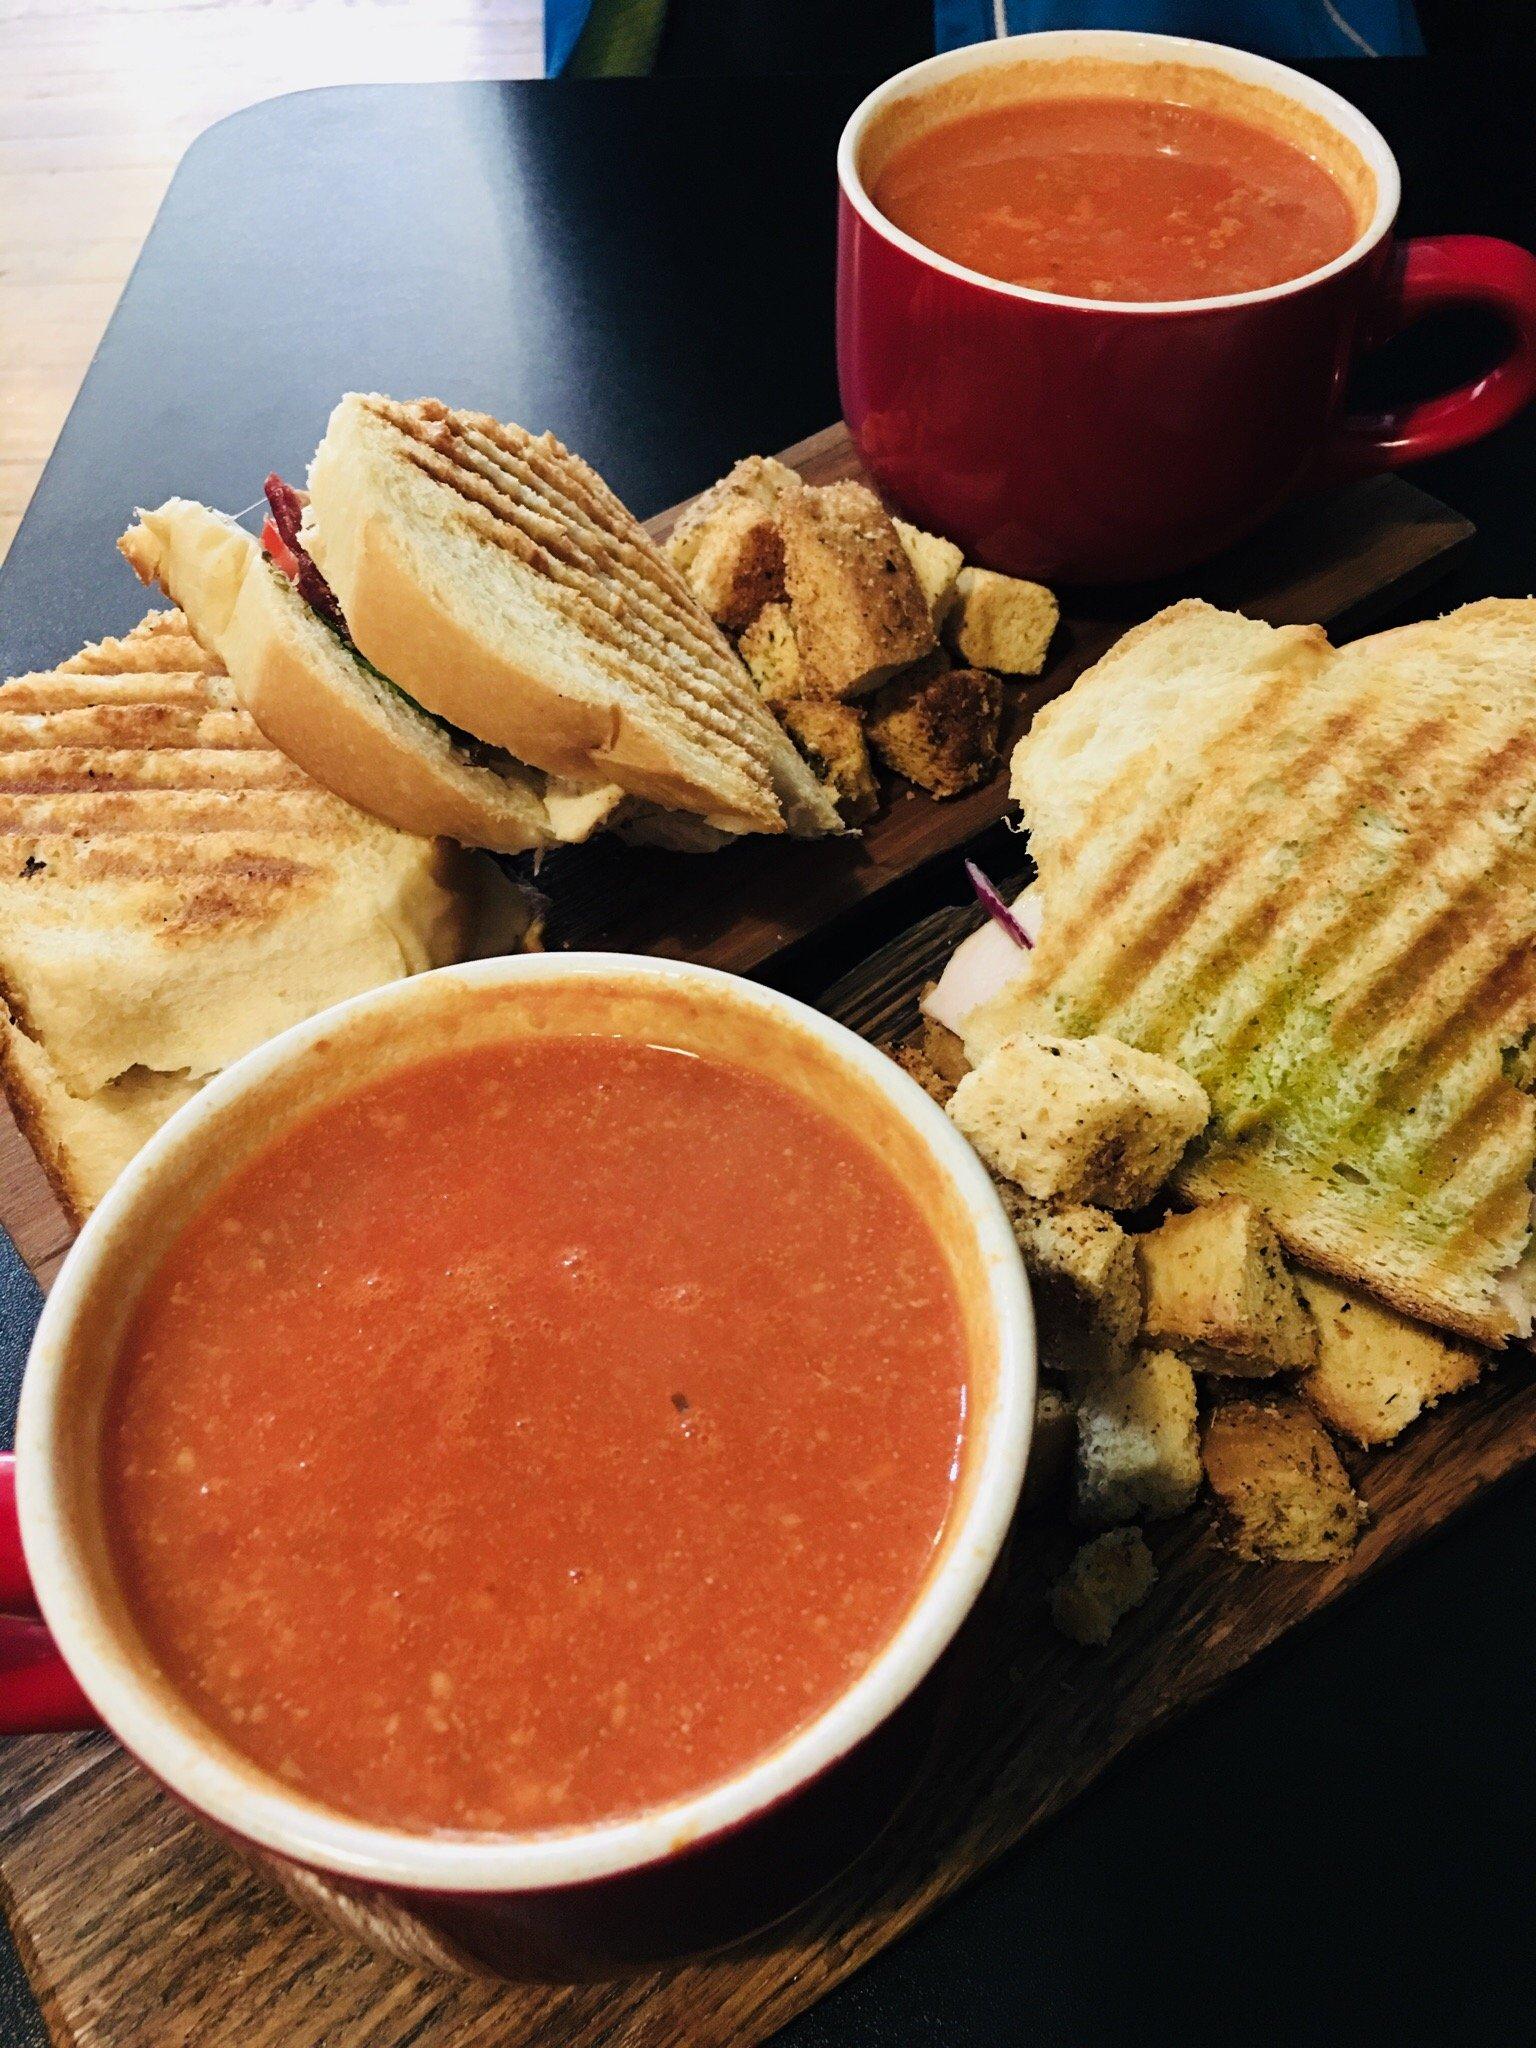 Tomato soup and panini